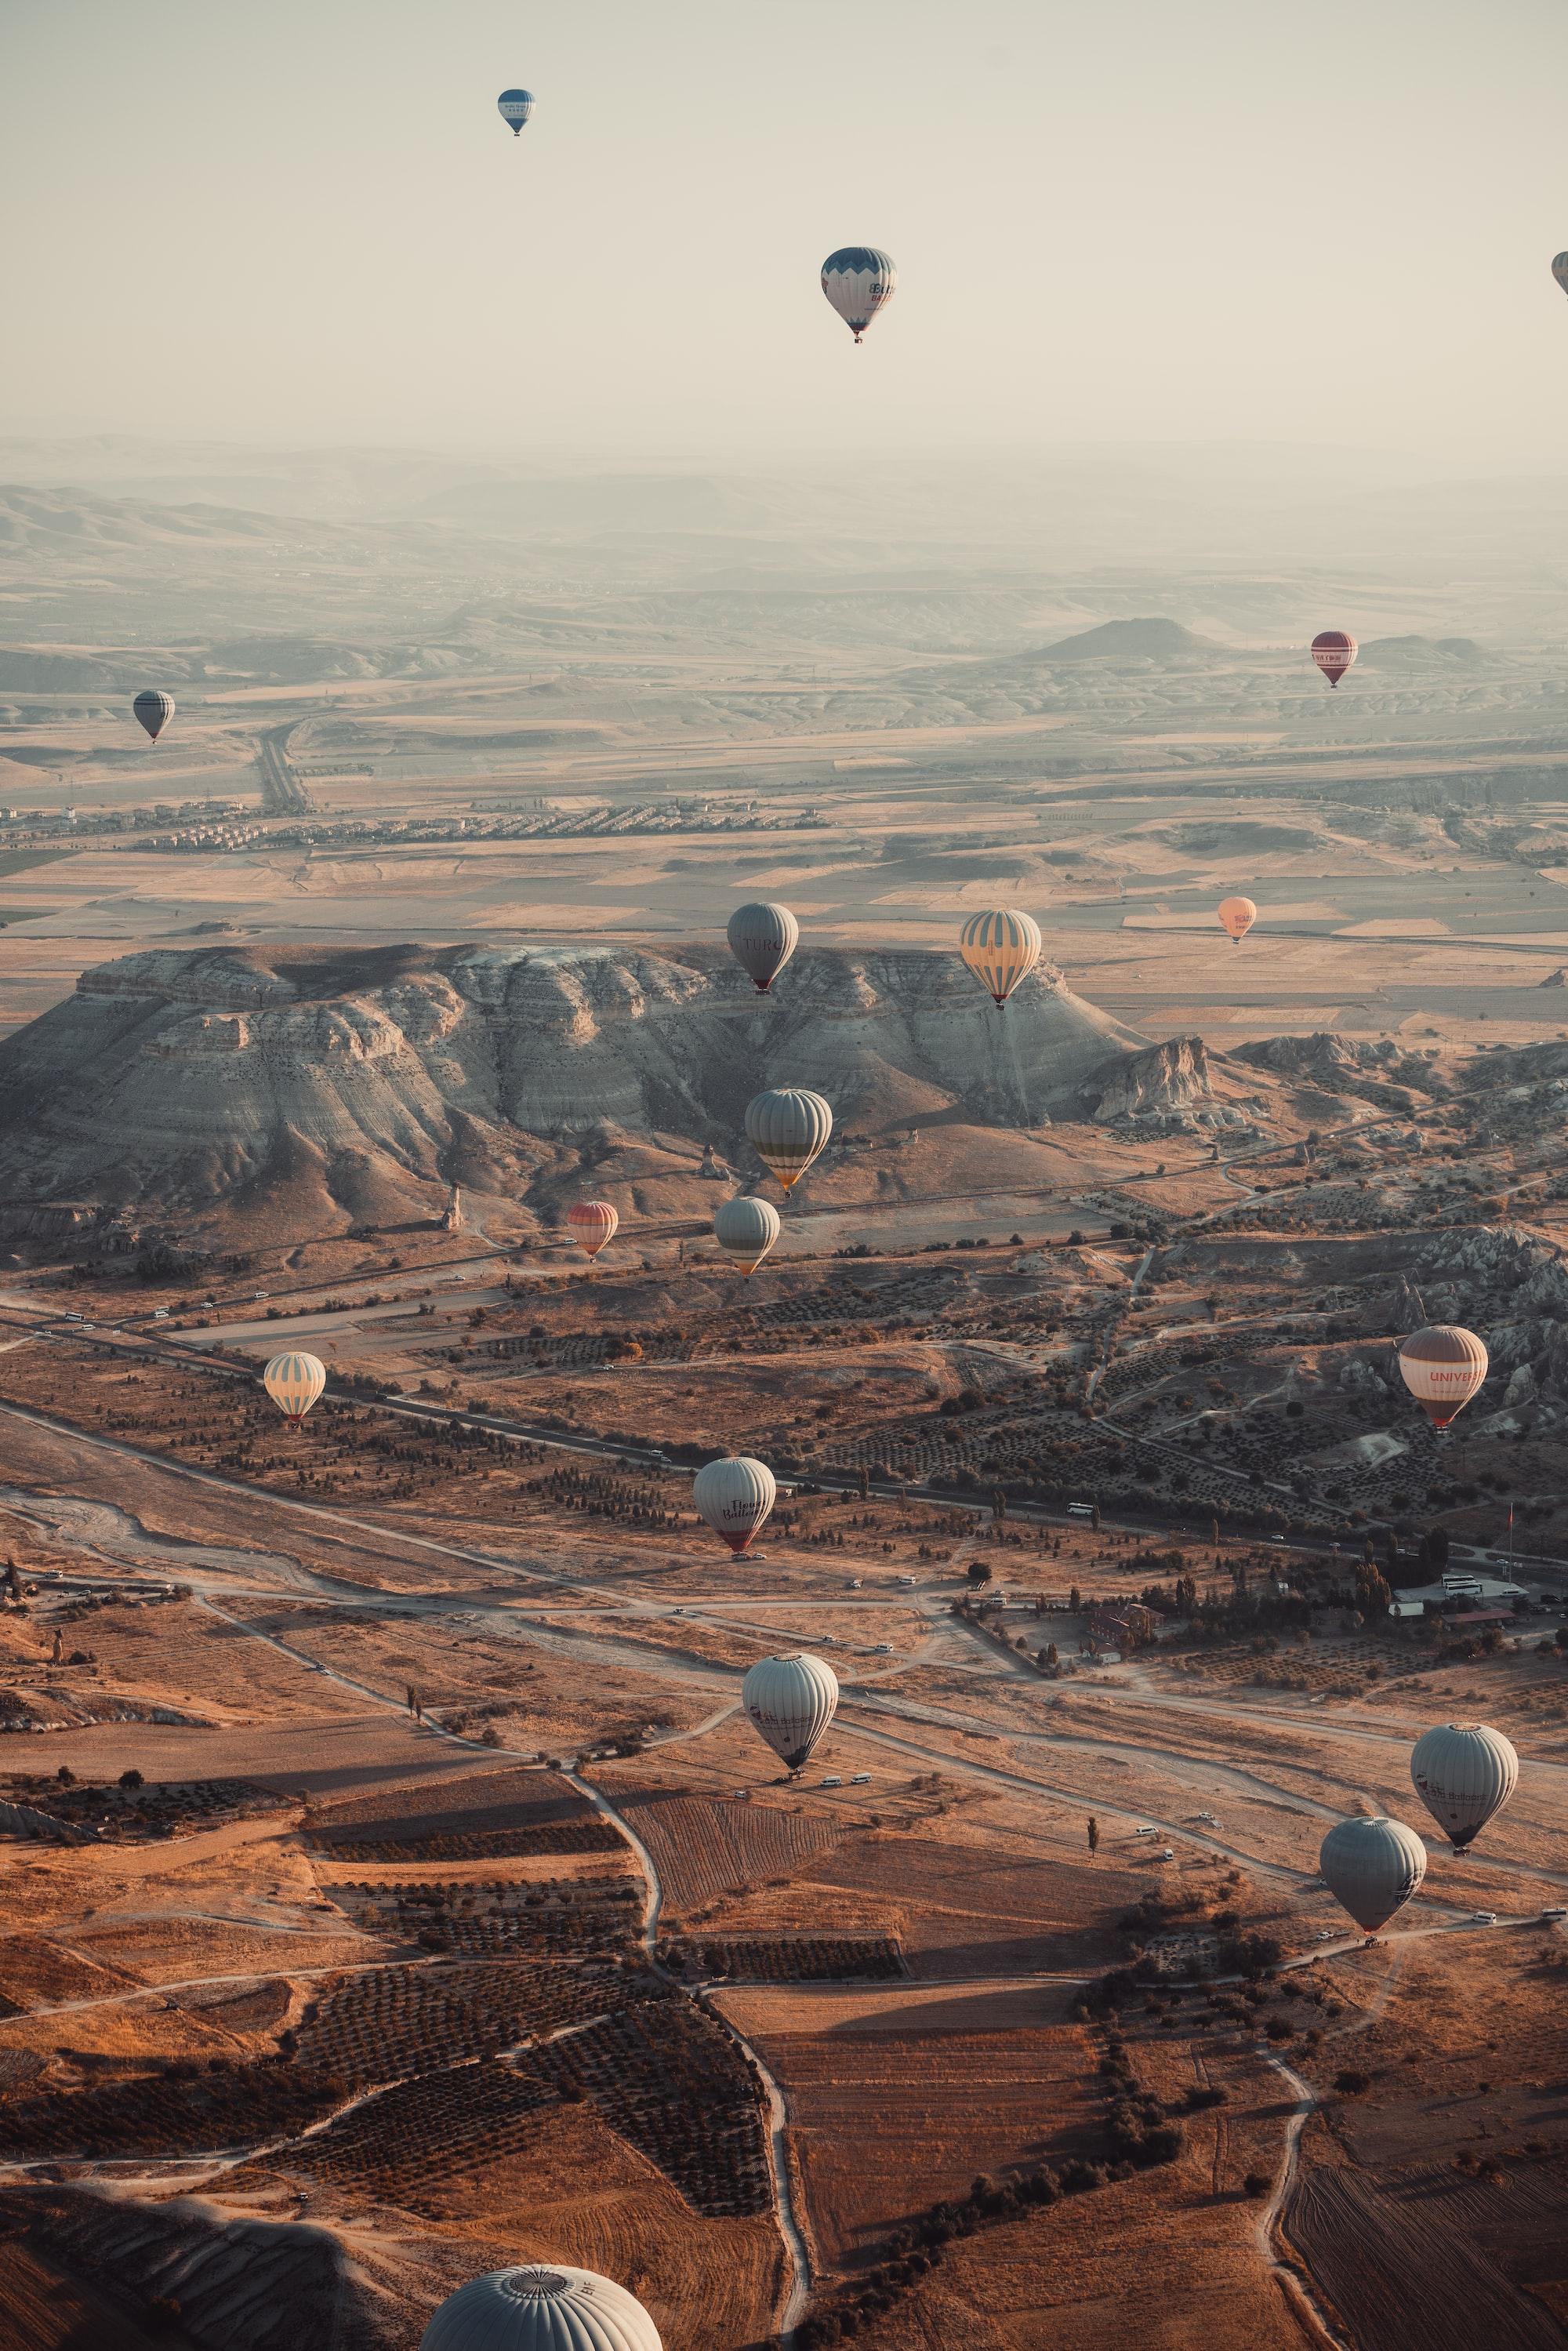 The Complete Guide to Cappadocia Balloon Festival, Turkey